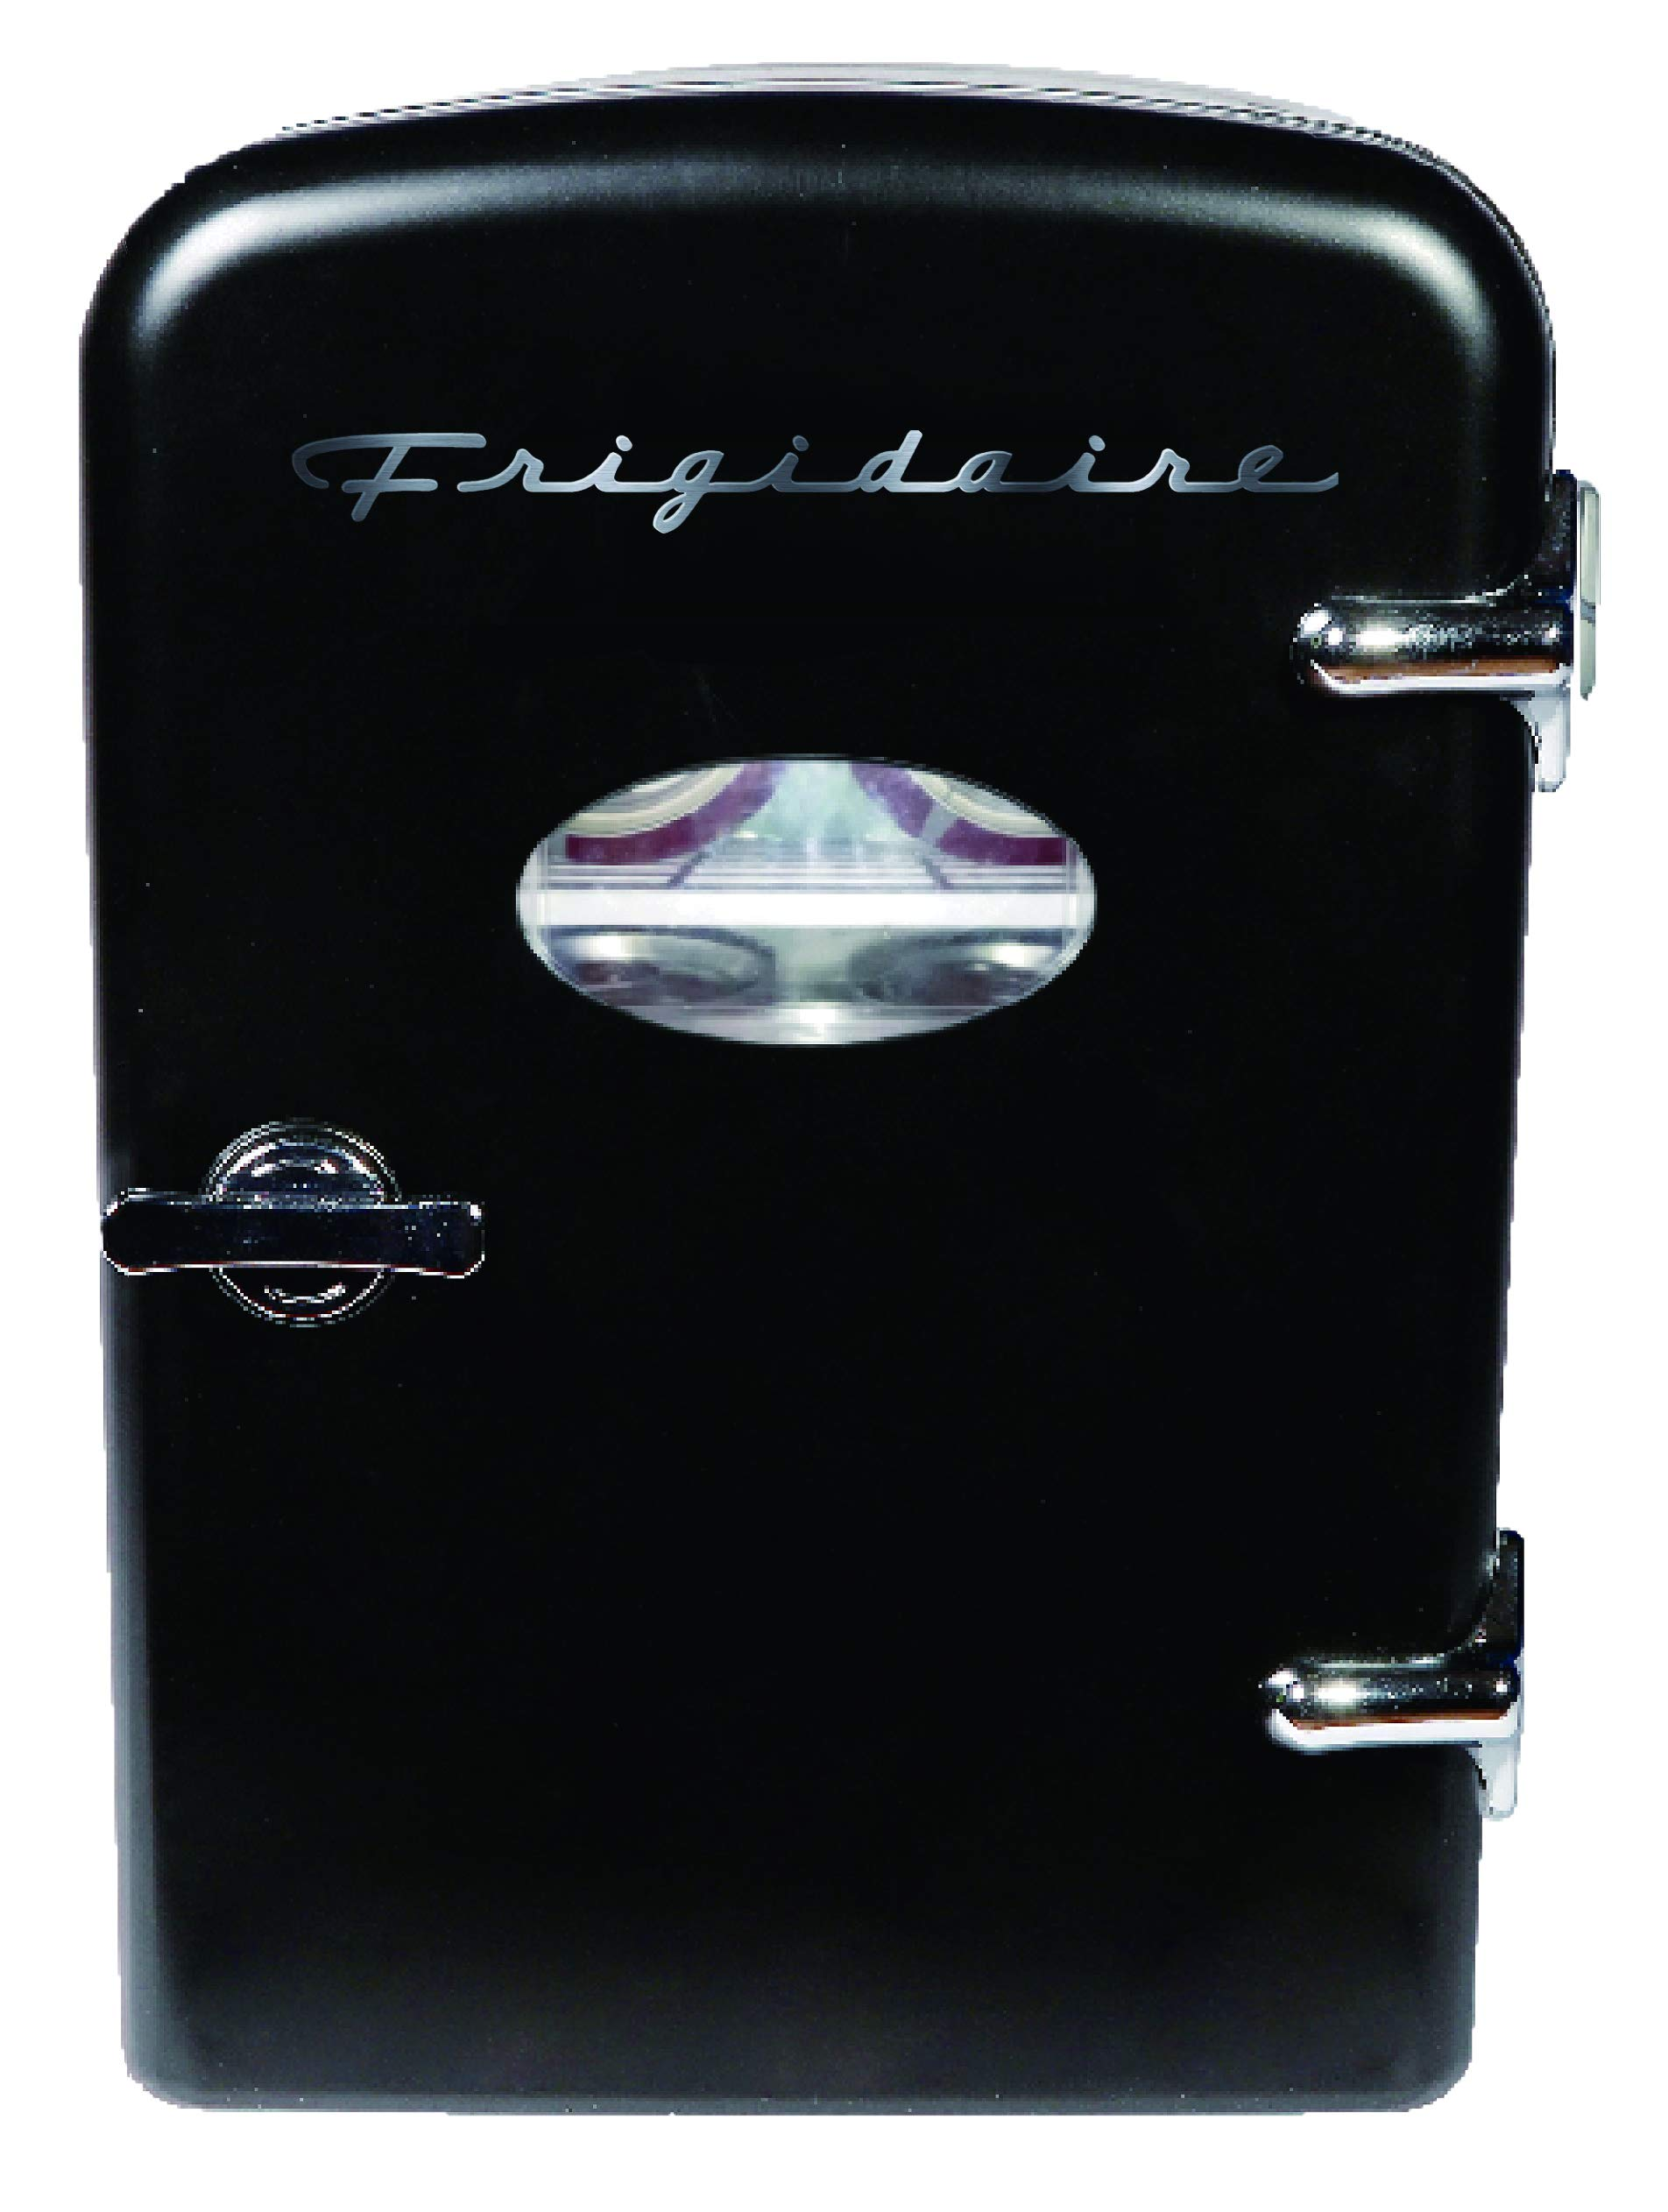 Frigidaire EFMIS129-BLACK 6 Can Retro Mini Portable Personal Fridge/Cooler for Home, Office or Dorm, Black